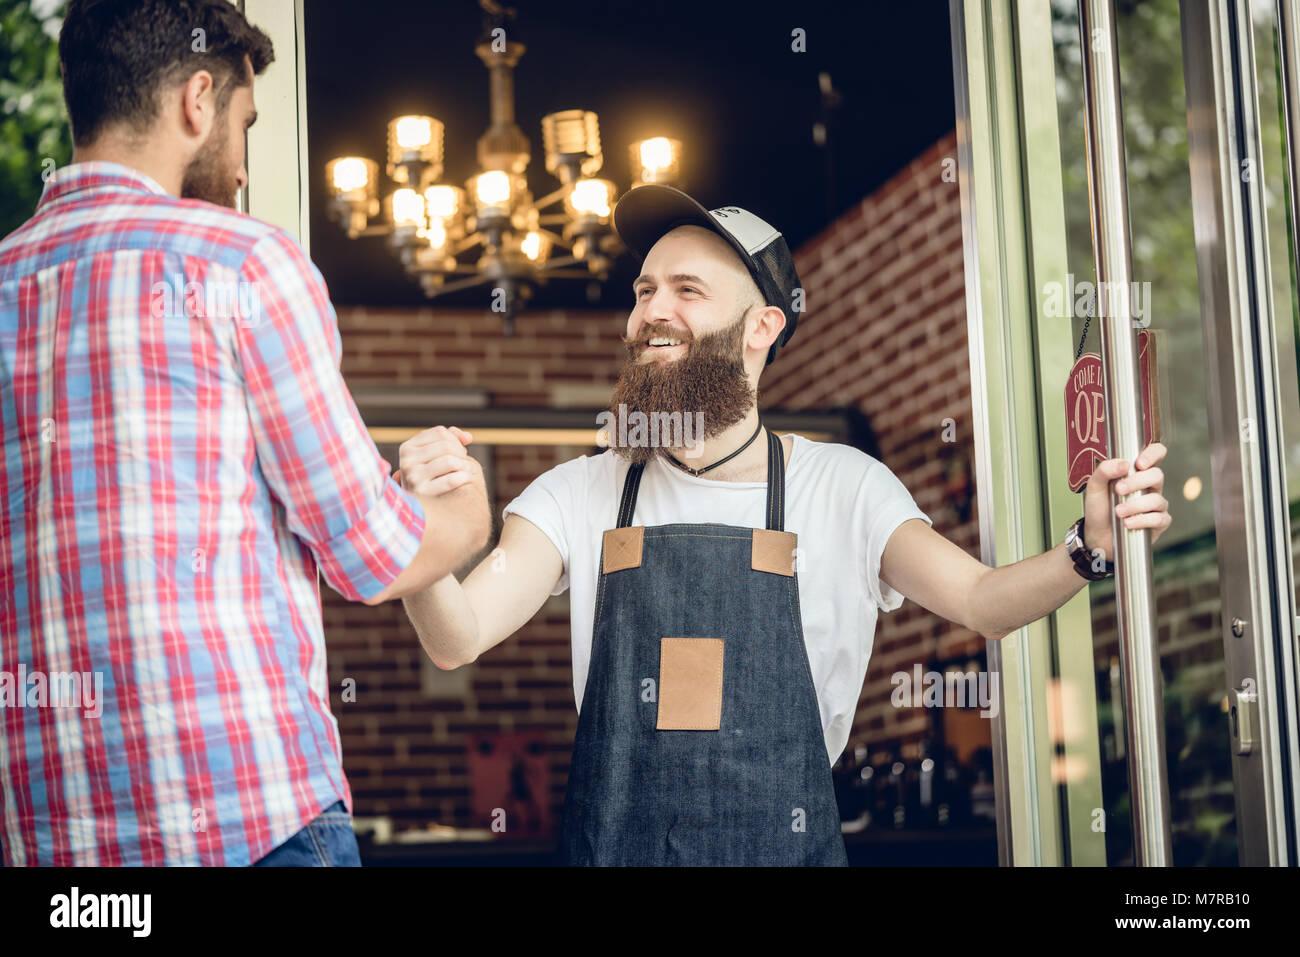 Cheerful barber greeting his male customer - Stock Image